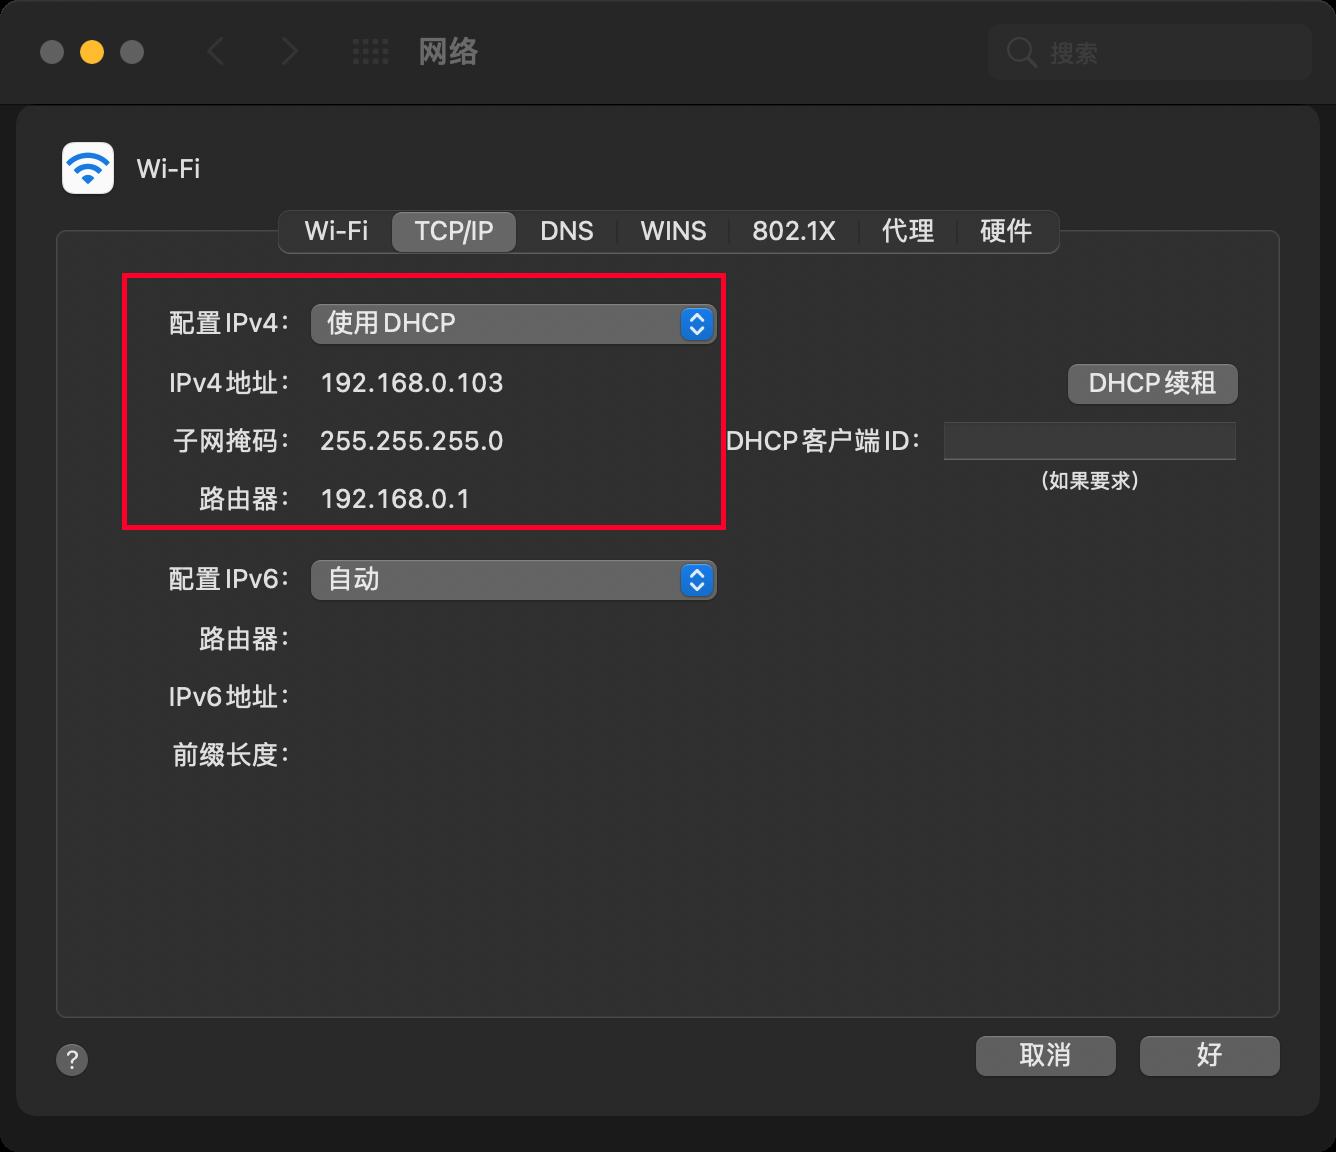 DHCP 局域网IP地址分配 - Mac - 网络设置 - TCP/IP.png